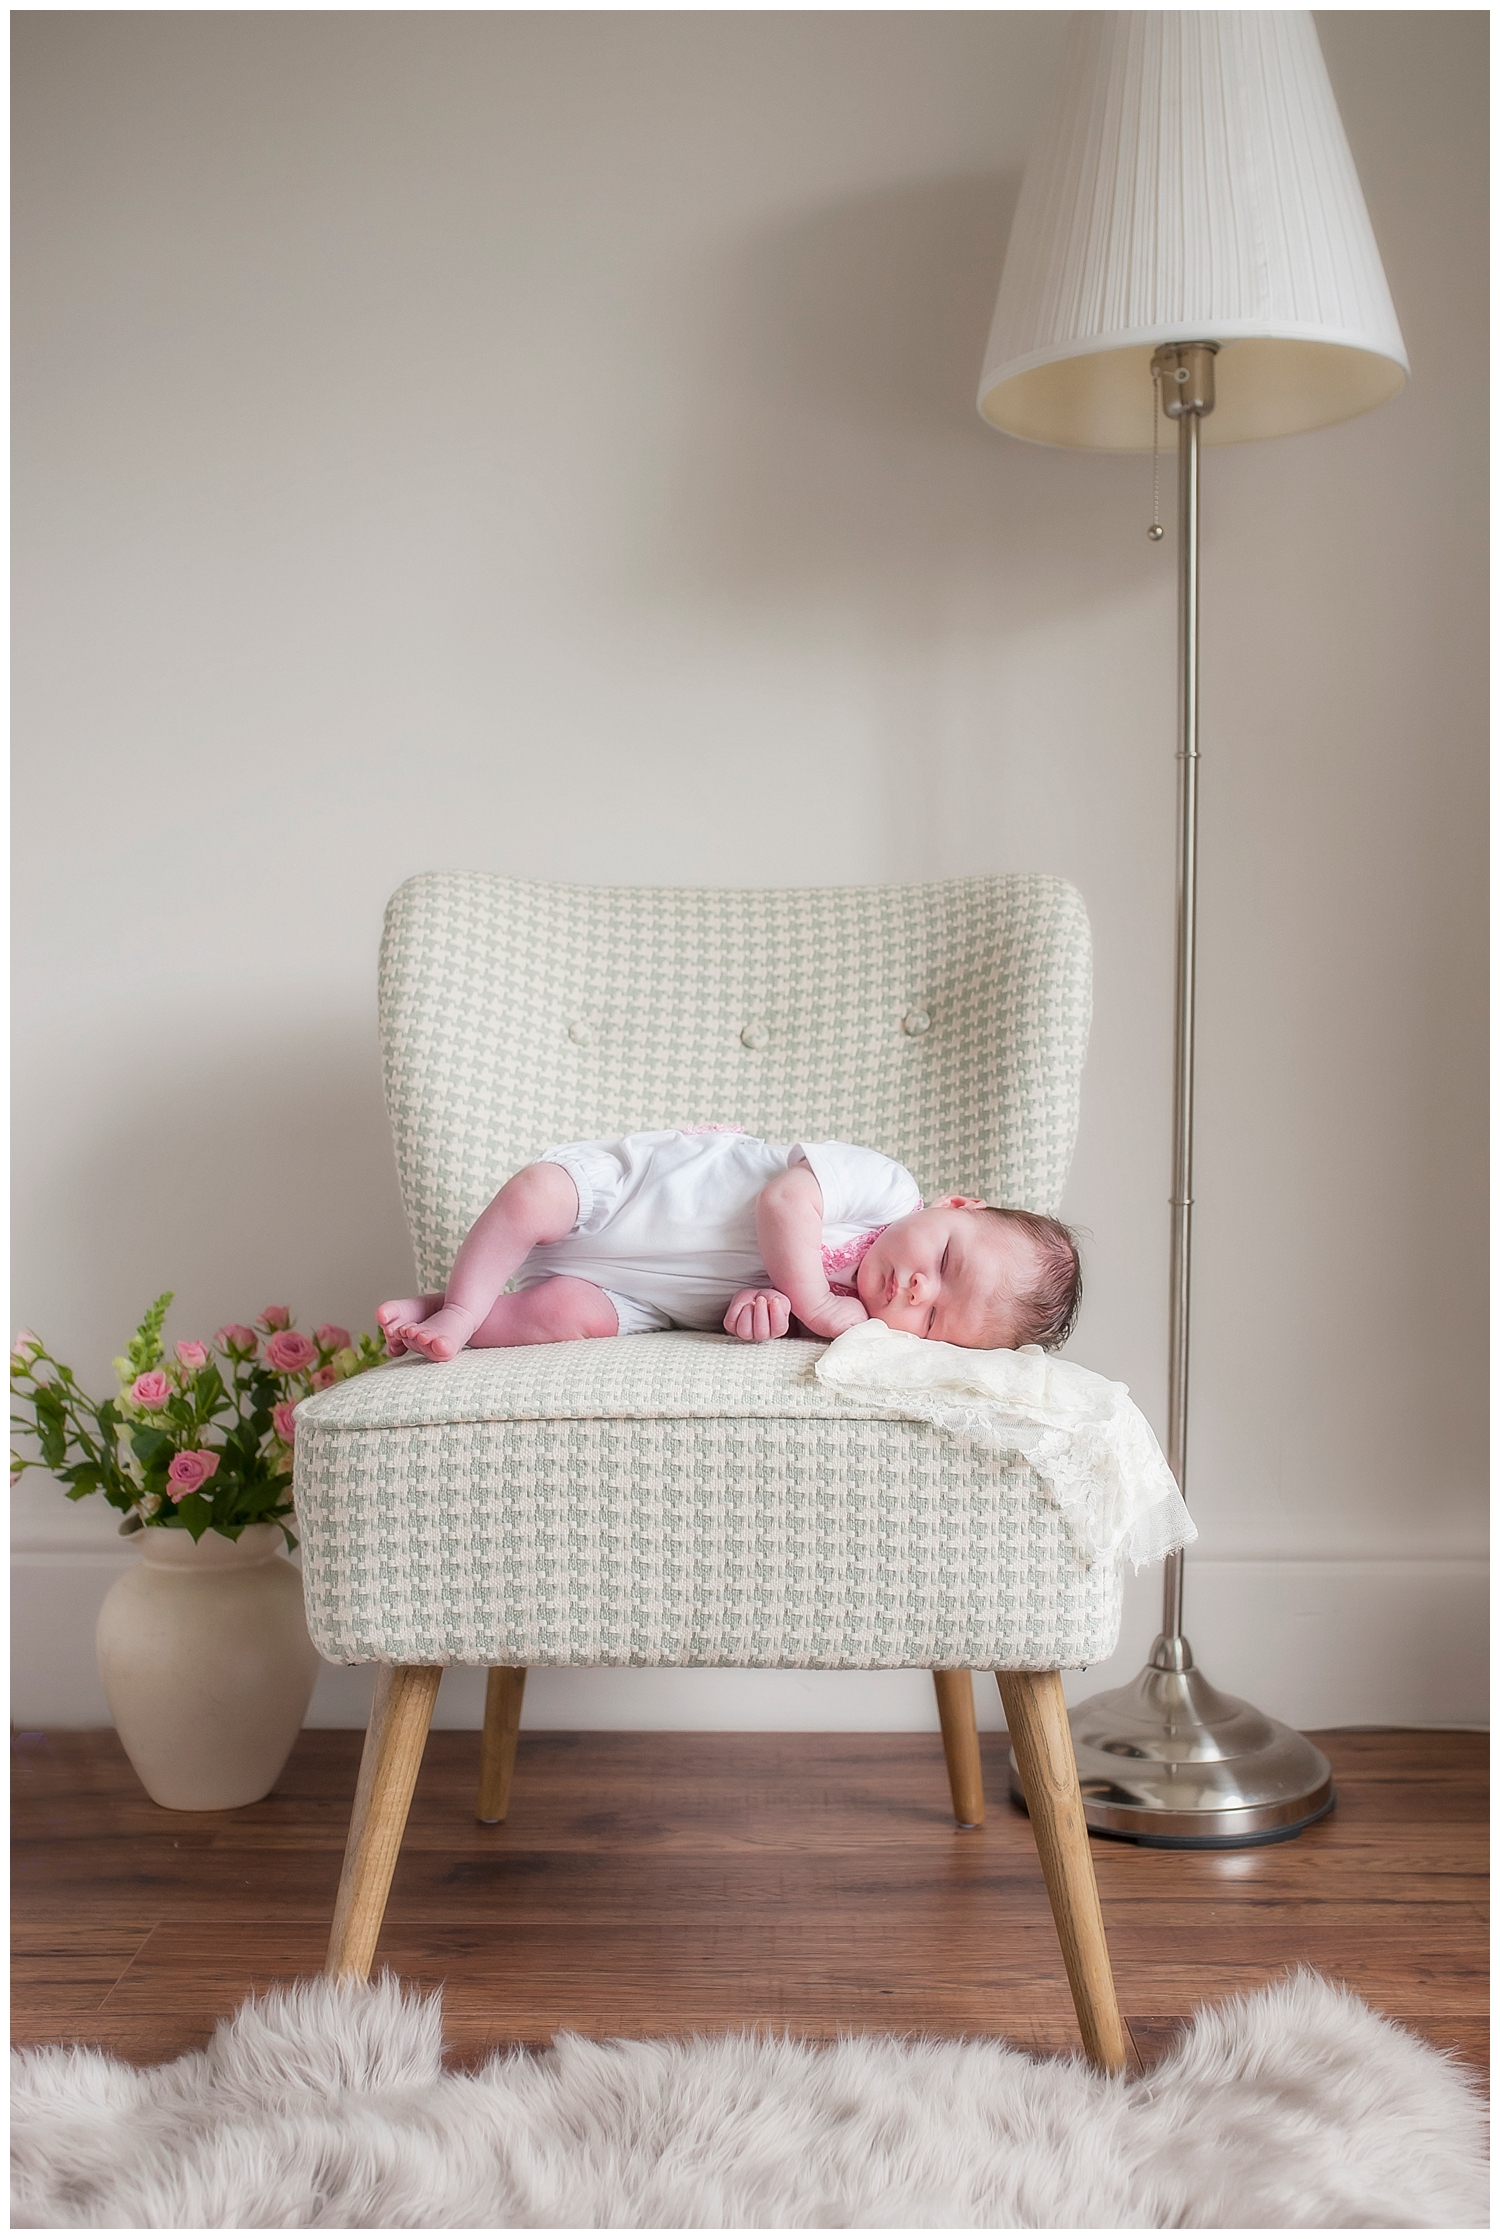 Sarah bee Photography, Cheshire New born Photography, Manchester newborn photographer, child and family Photographer manchester_0025.jpg